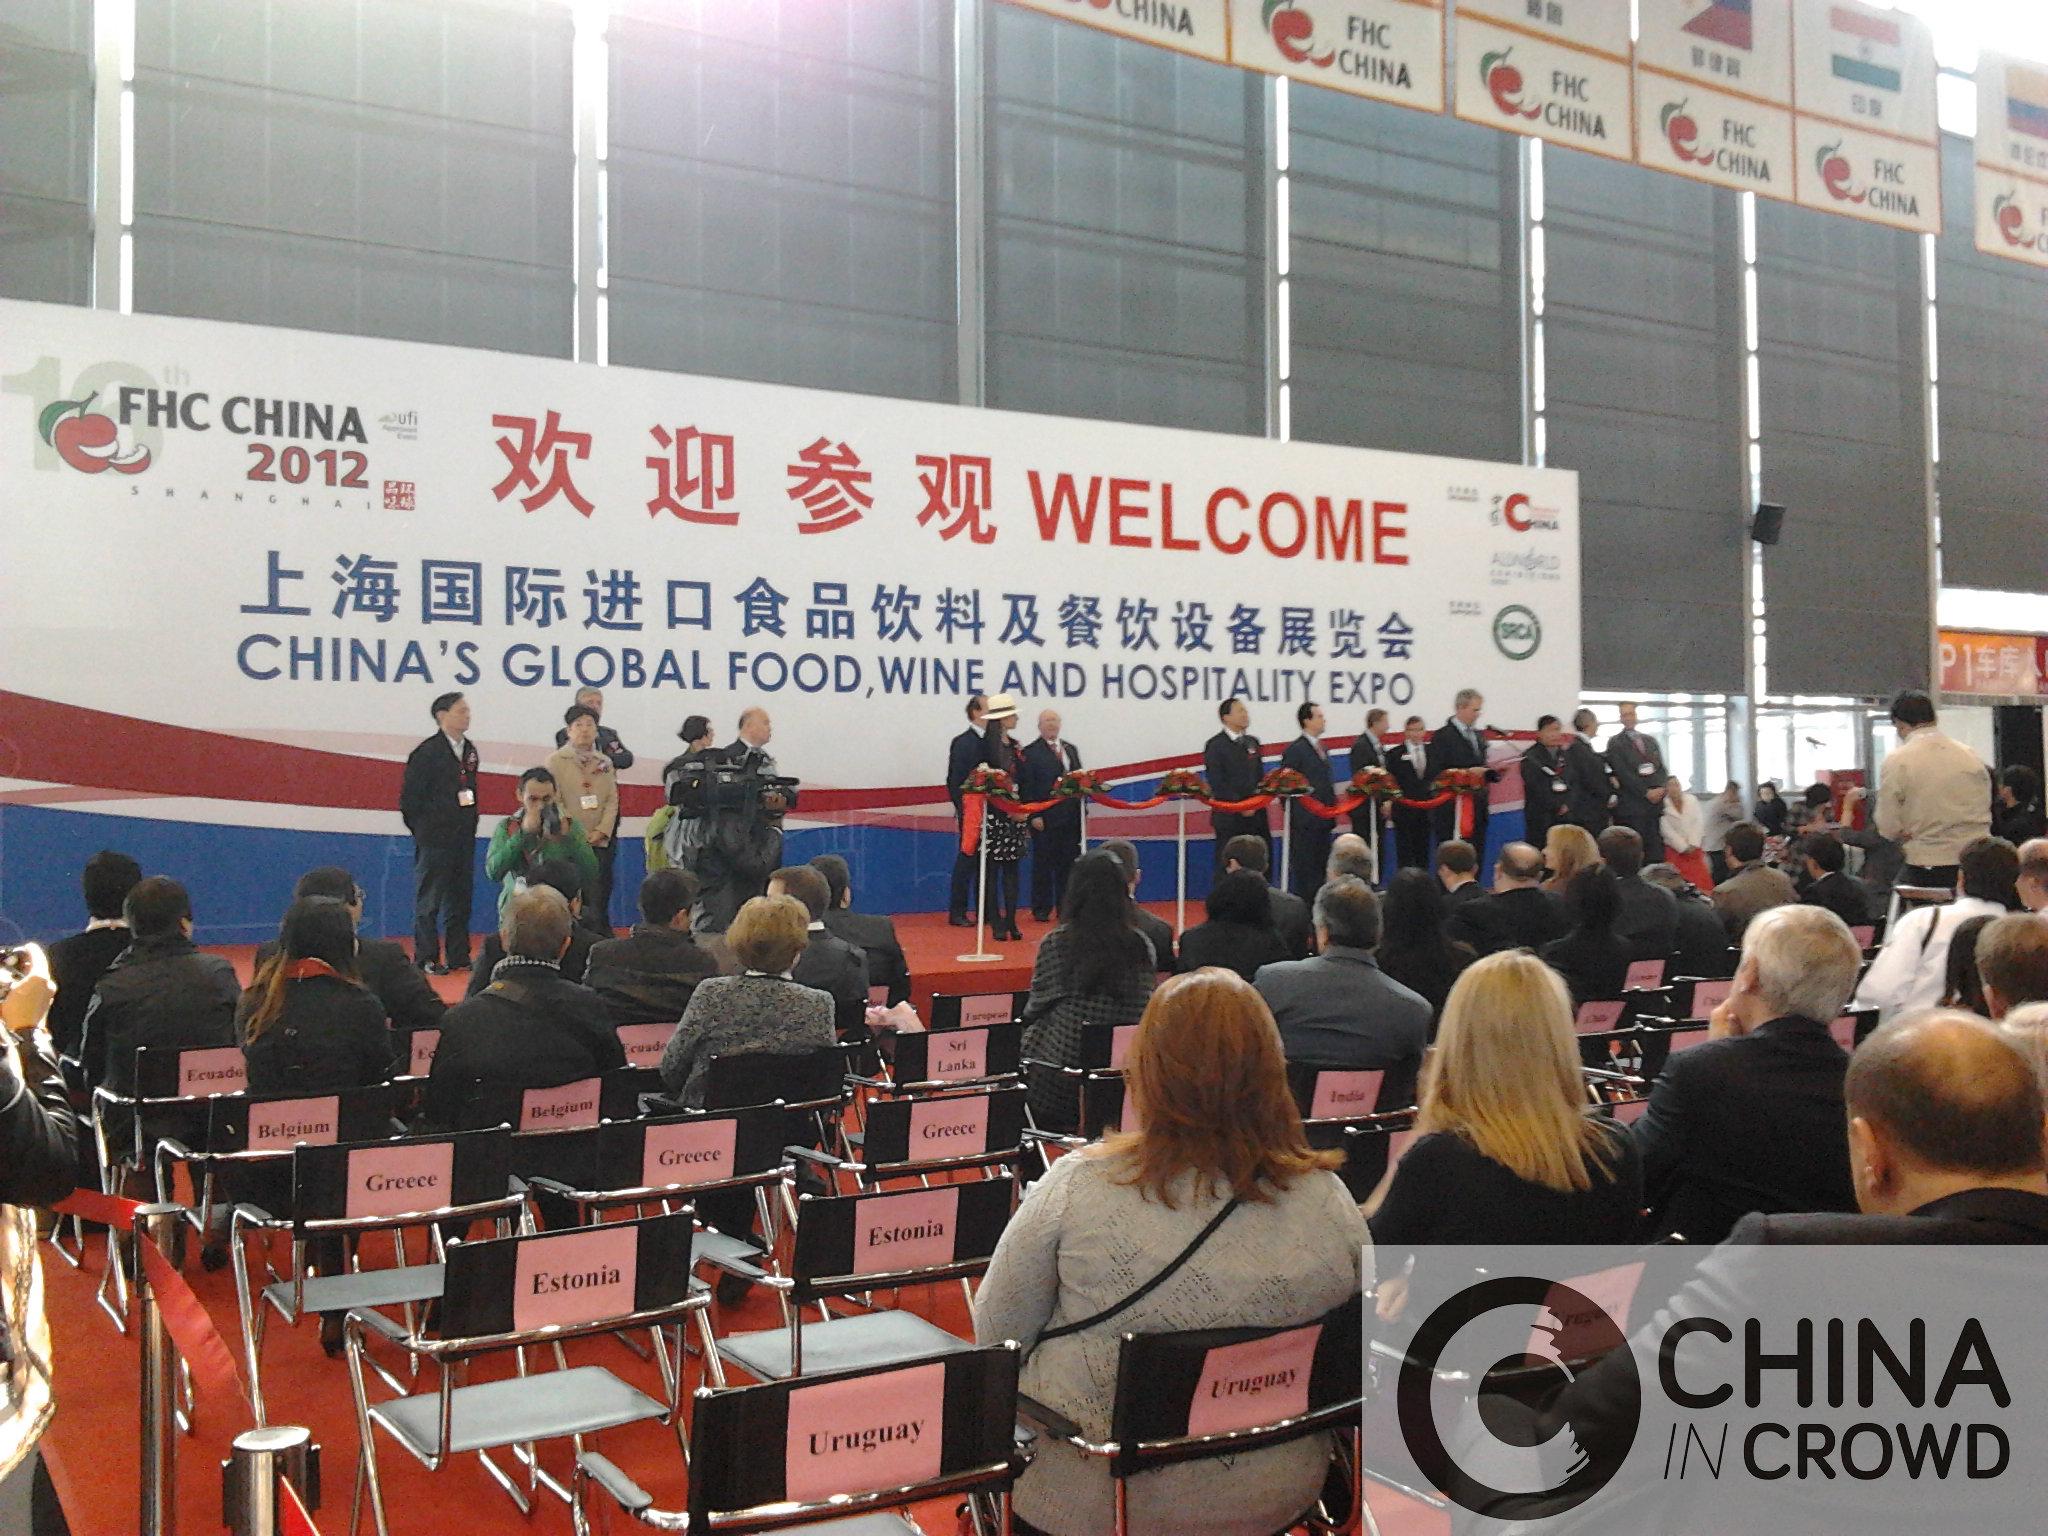 中国食品酒店展 (FHC) CHINA IN CROWD